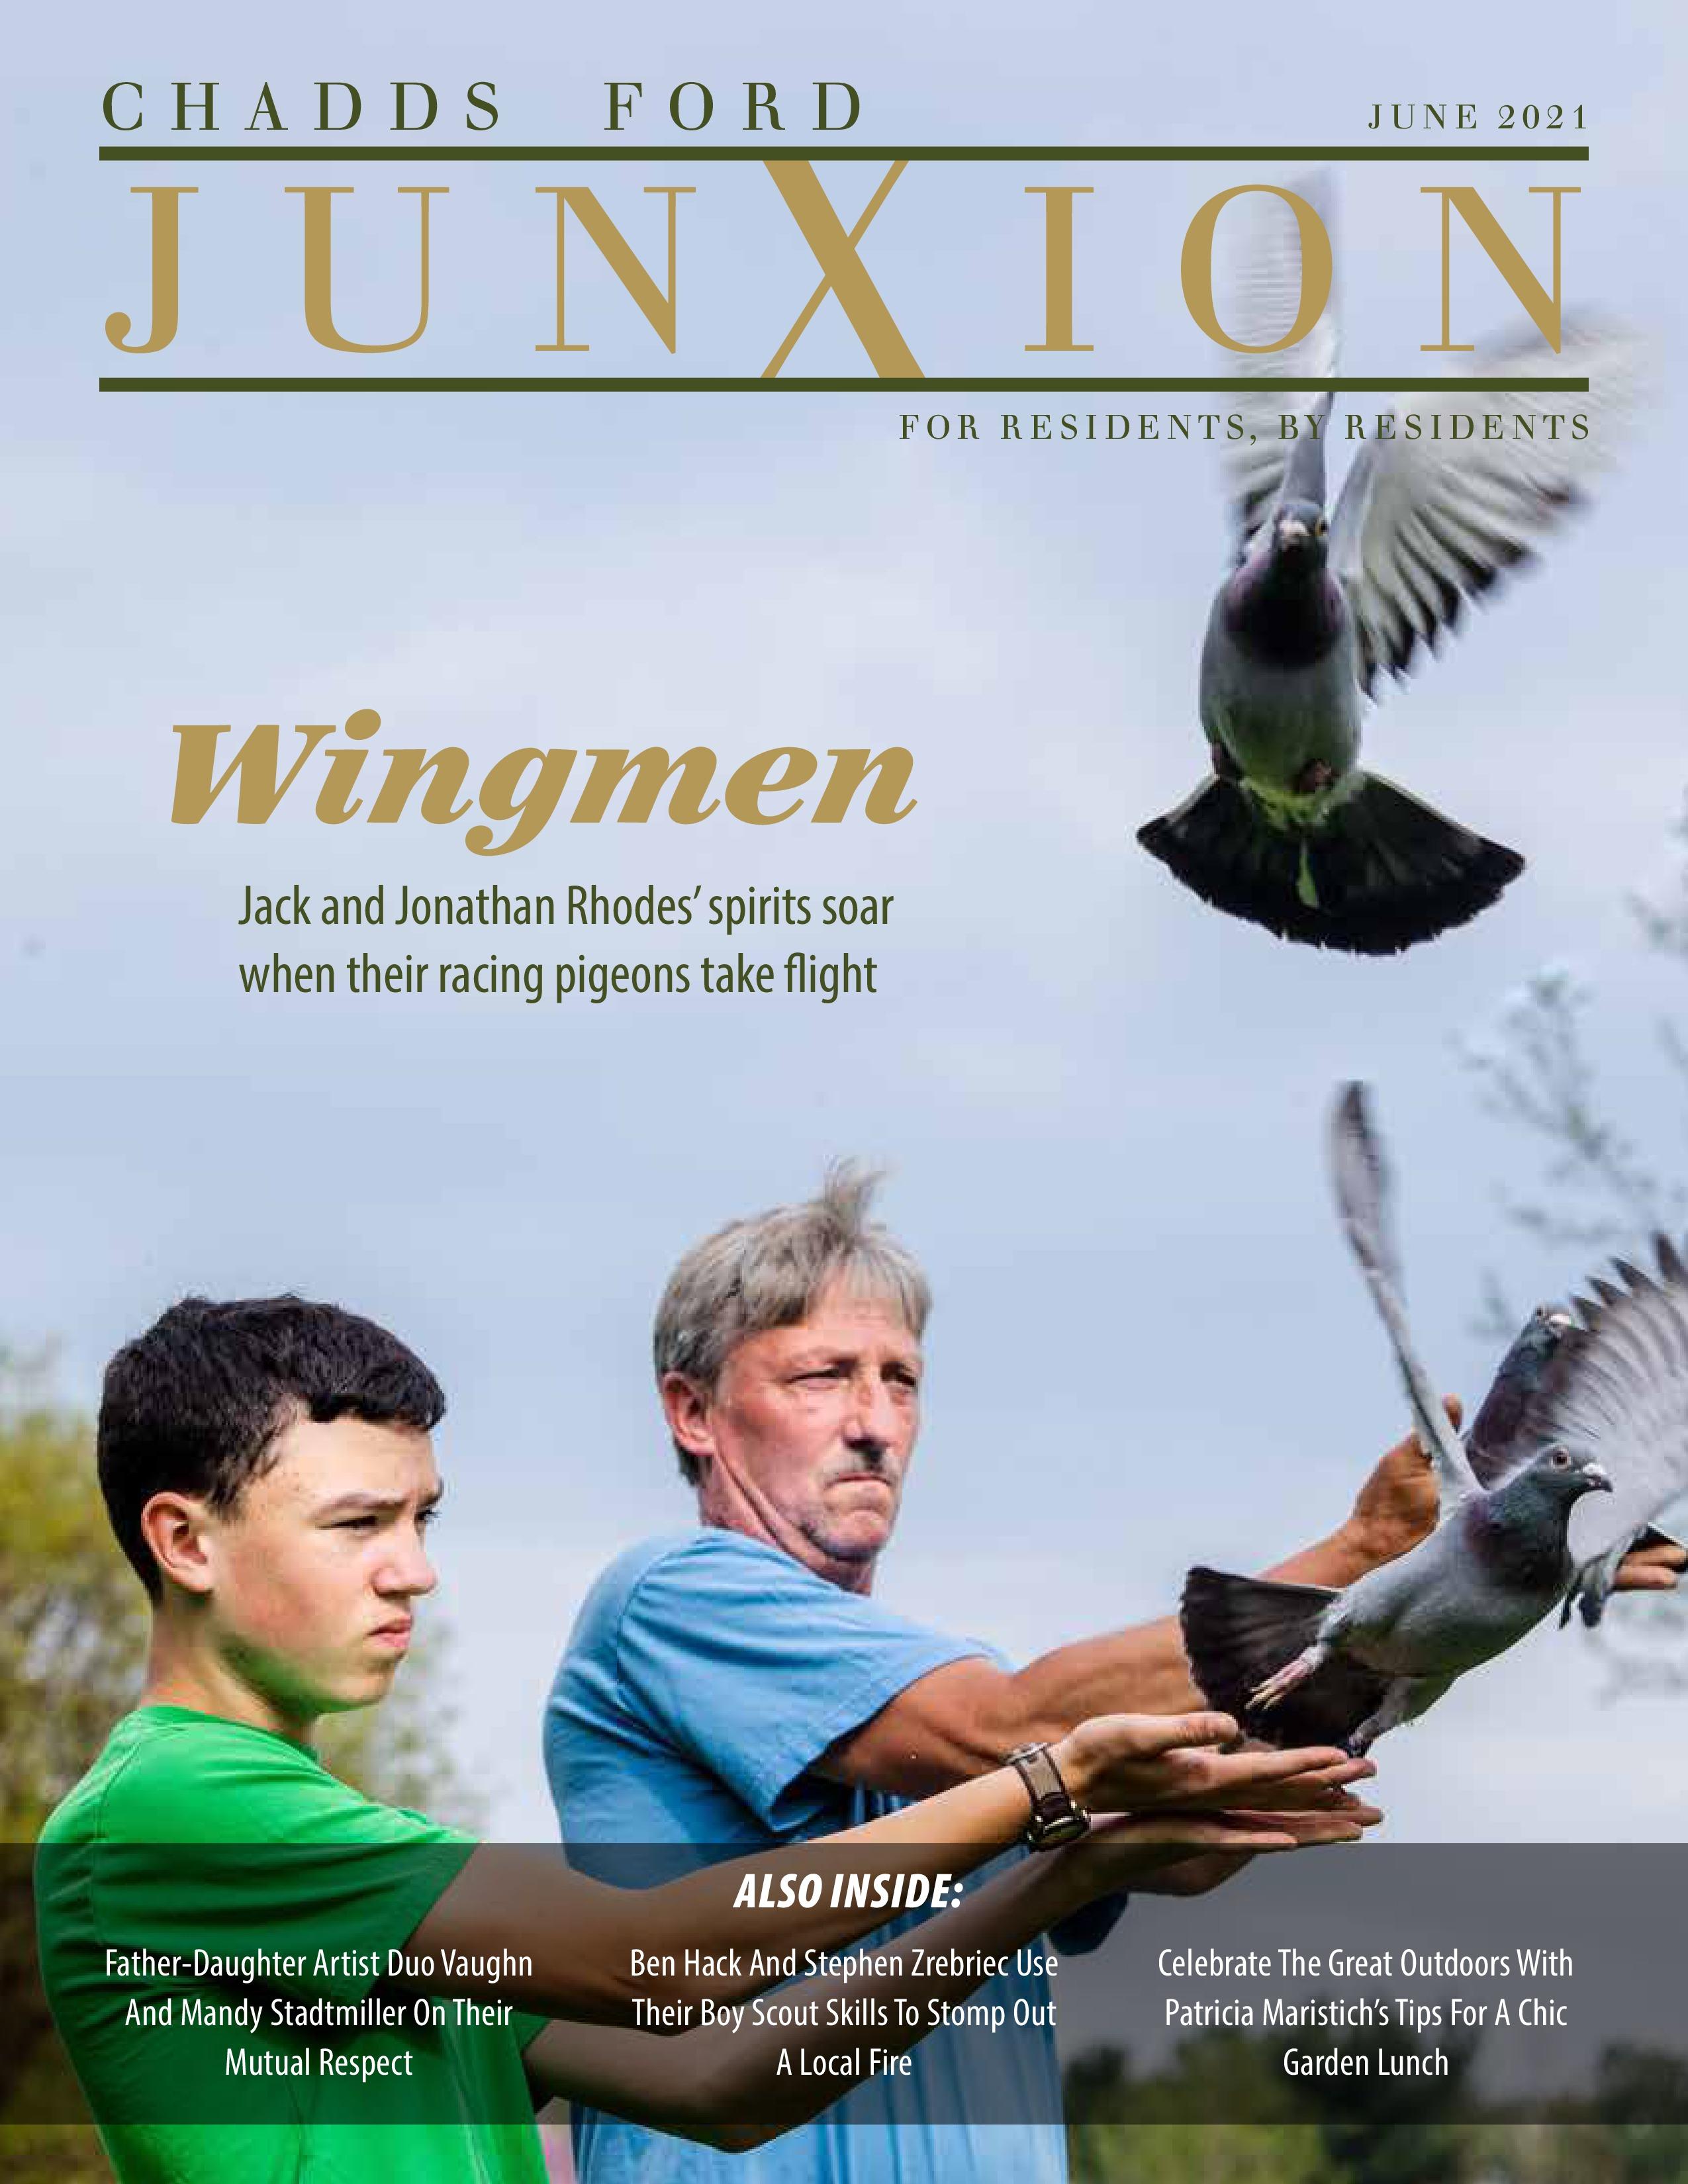 Chadds Ford JunXion Community 2021-06-01